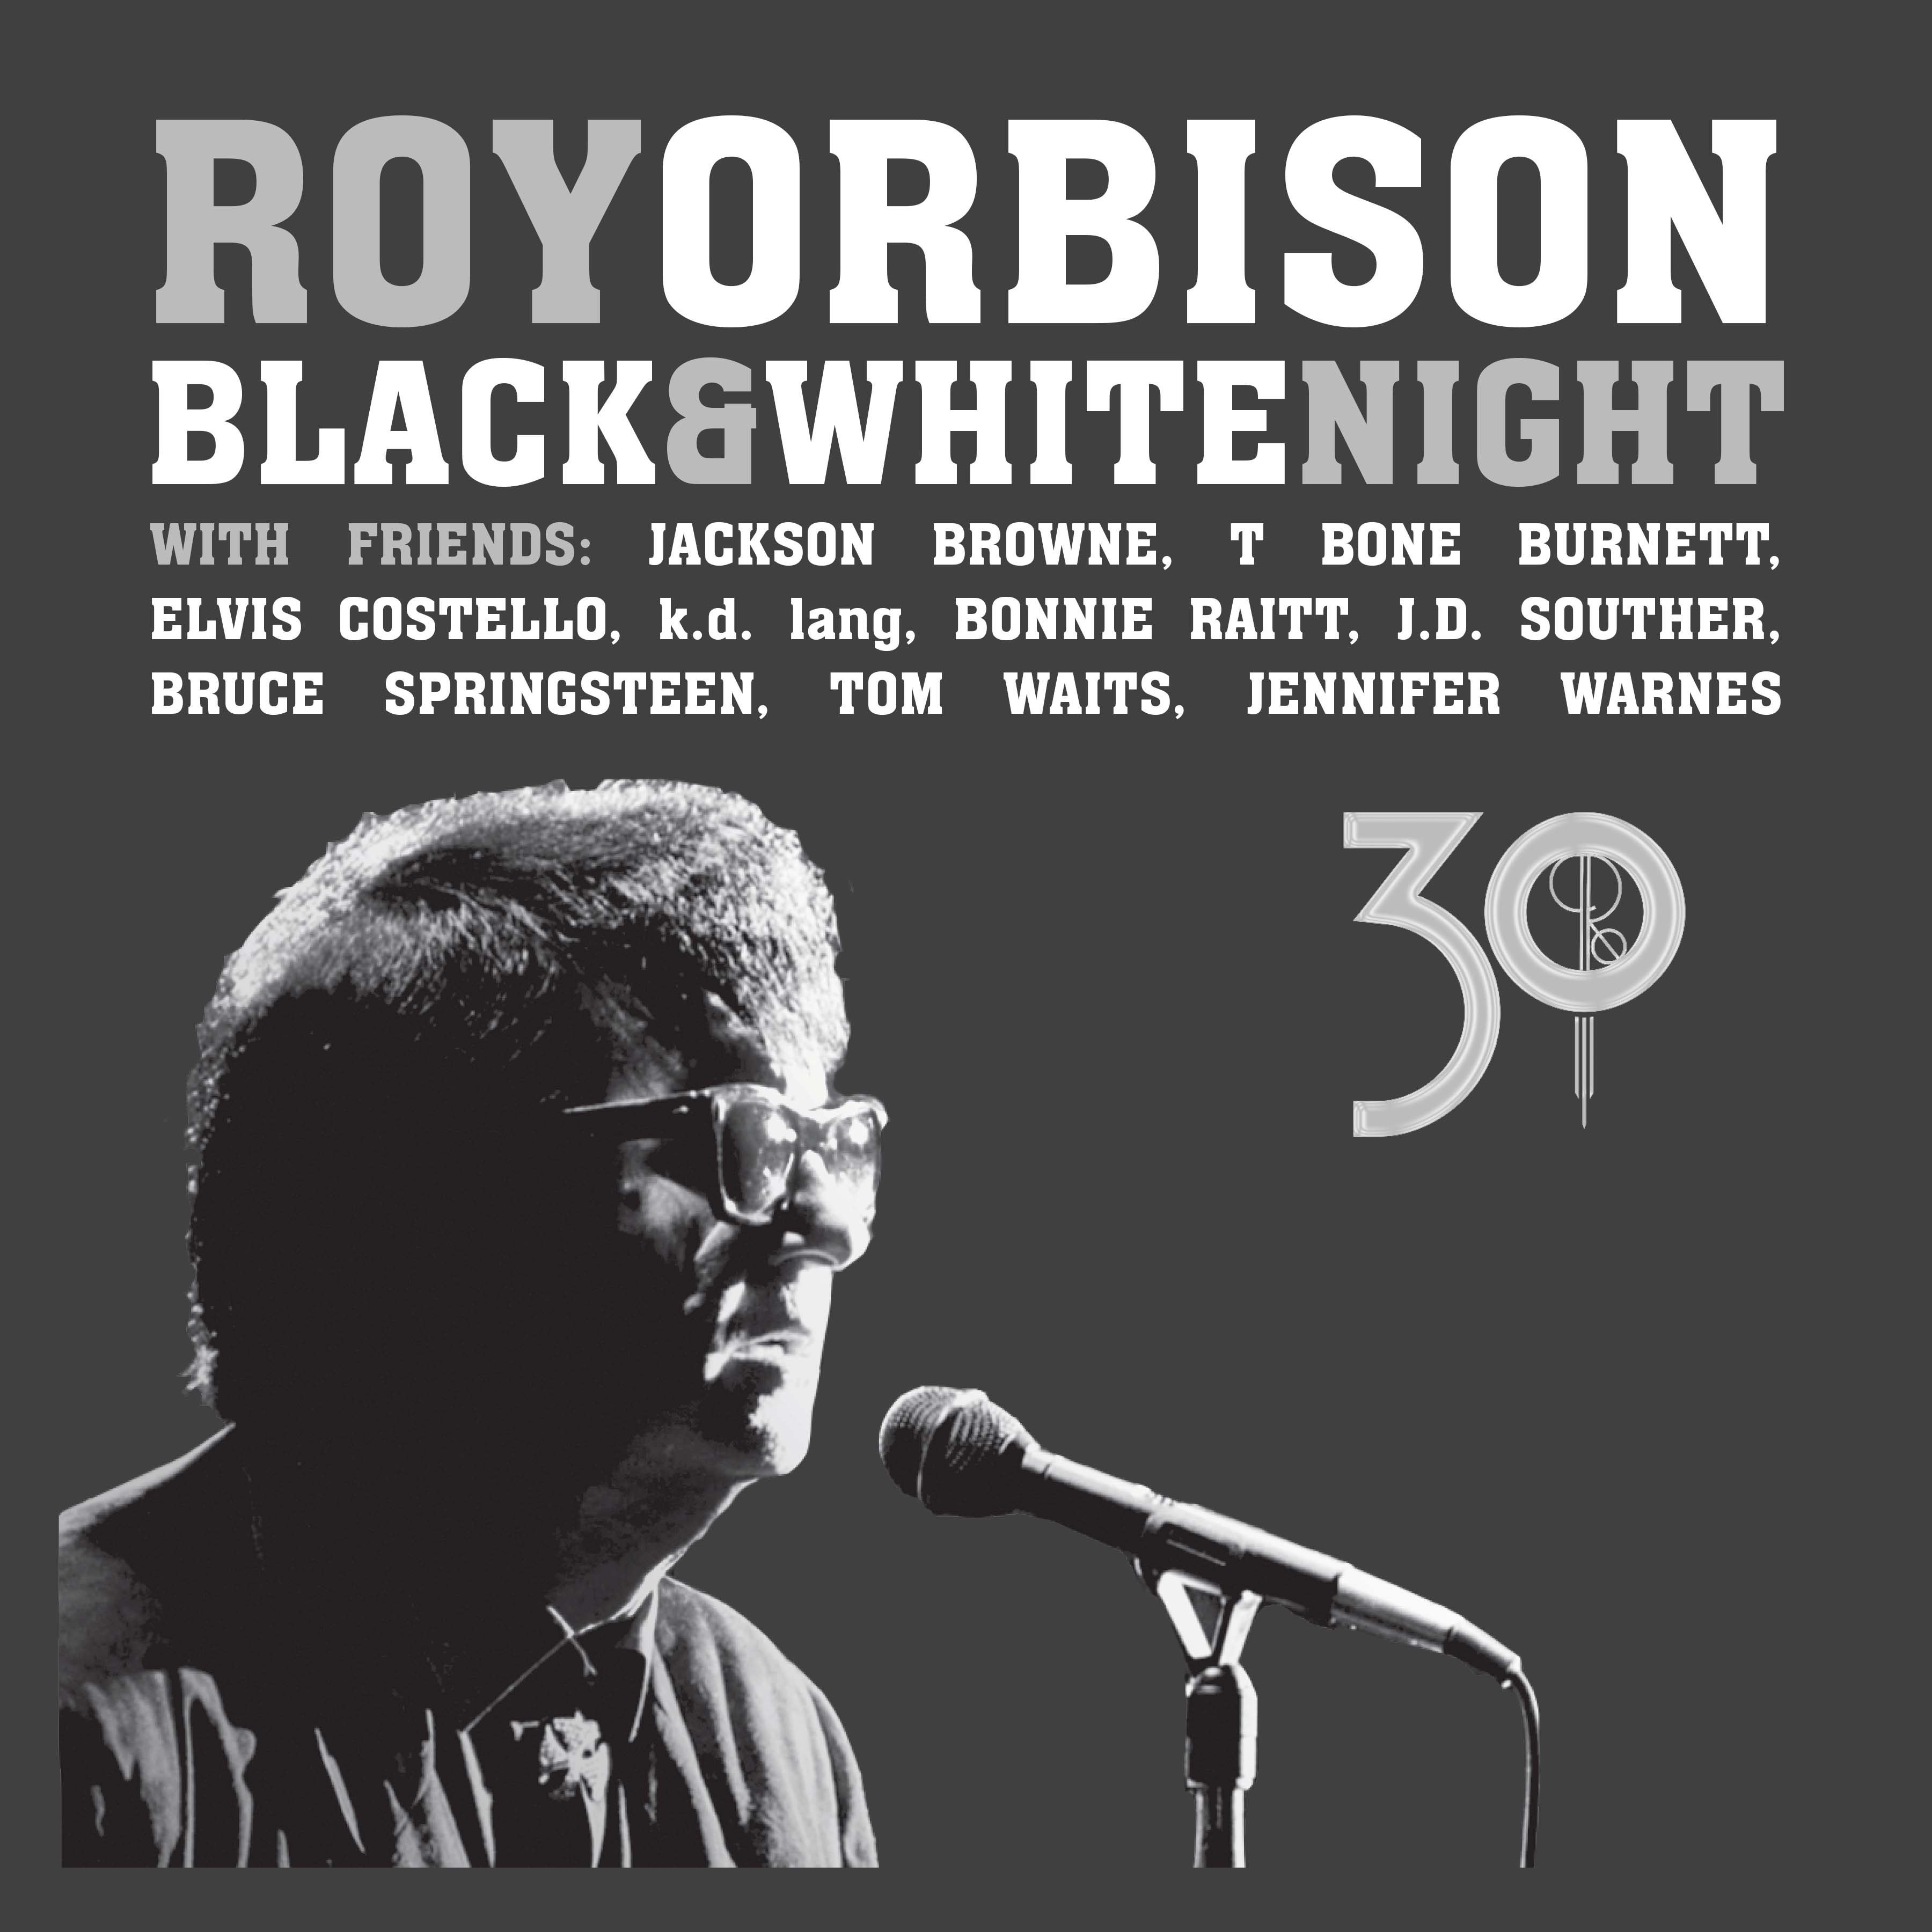 Black & White Night 30 CD/DVD from Roy Orbison Online Store